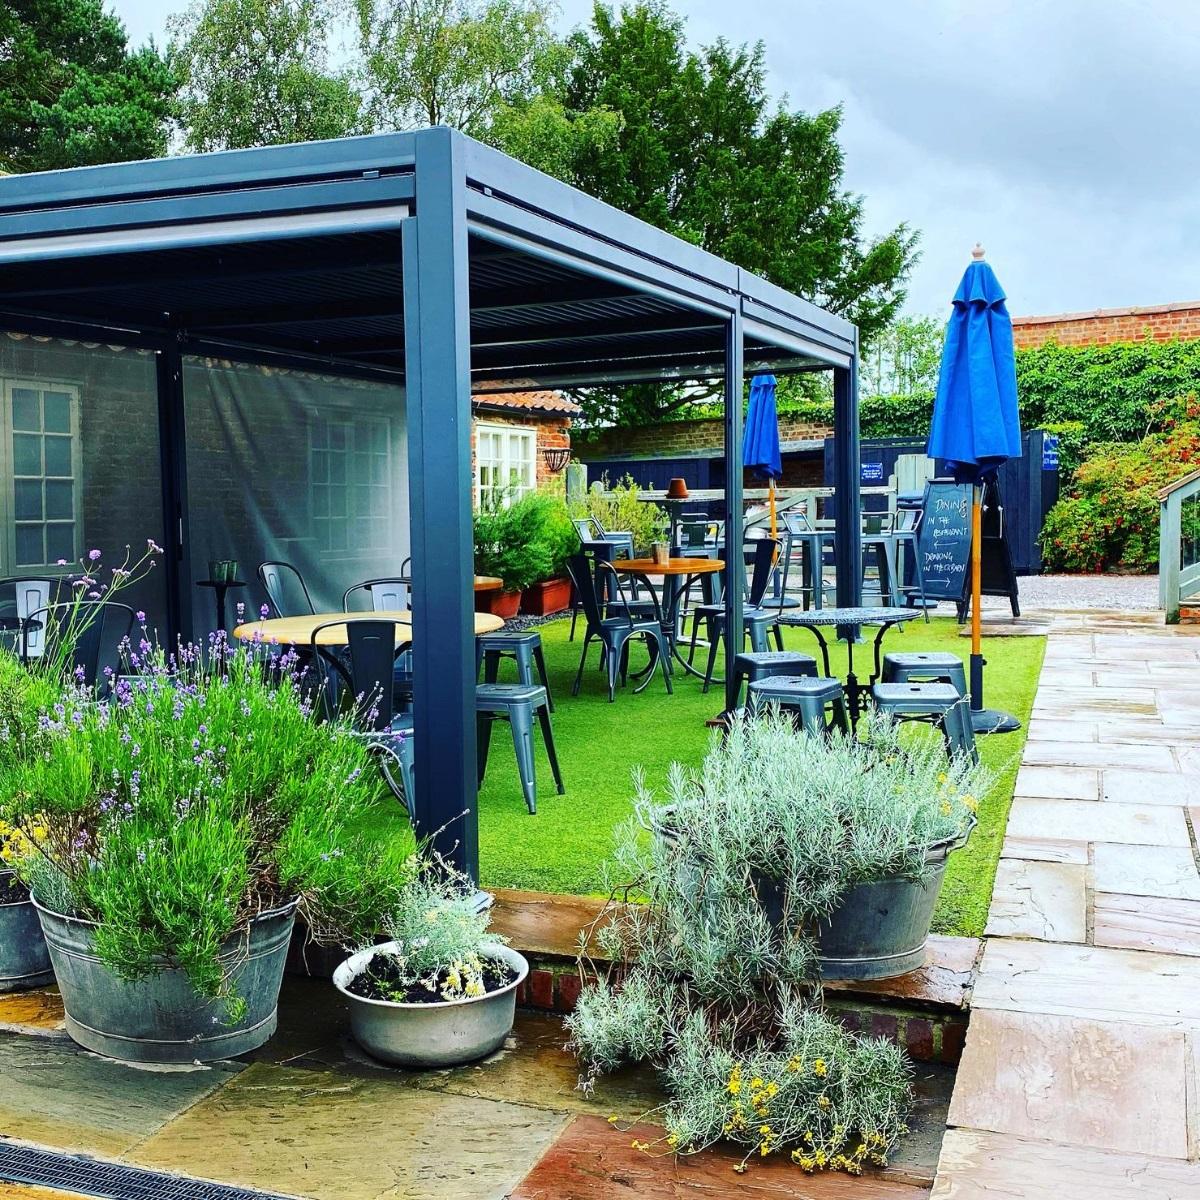 A rectangular grey metal gazebo covering 4 tables in a pub garden